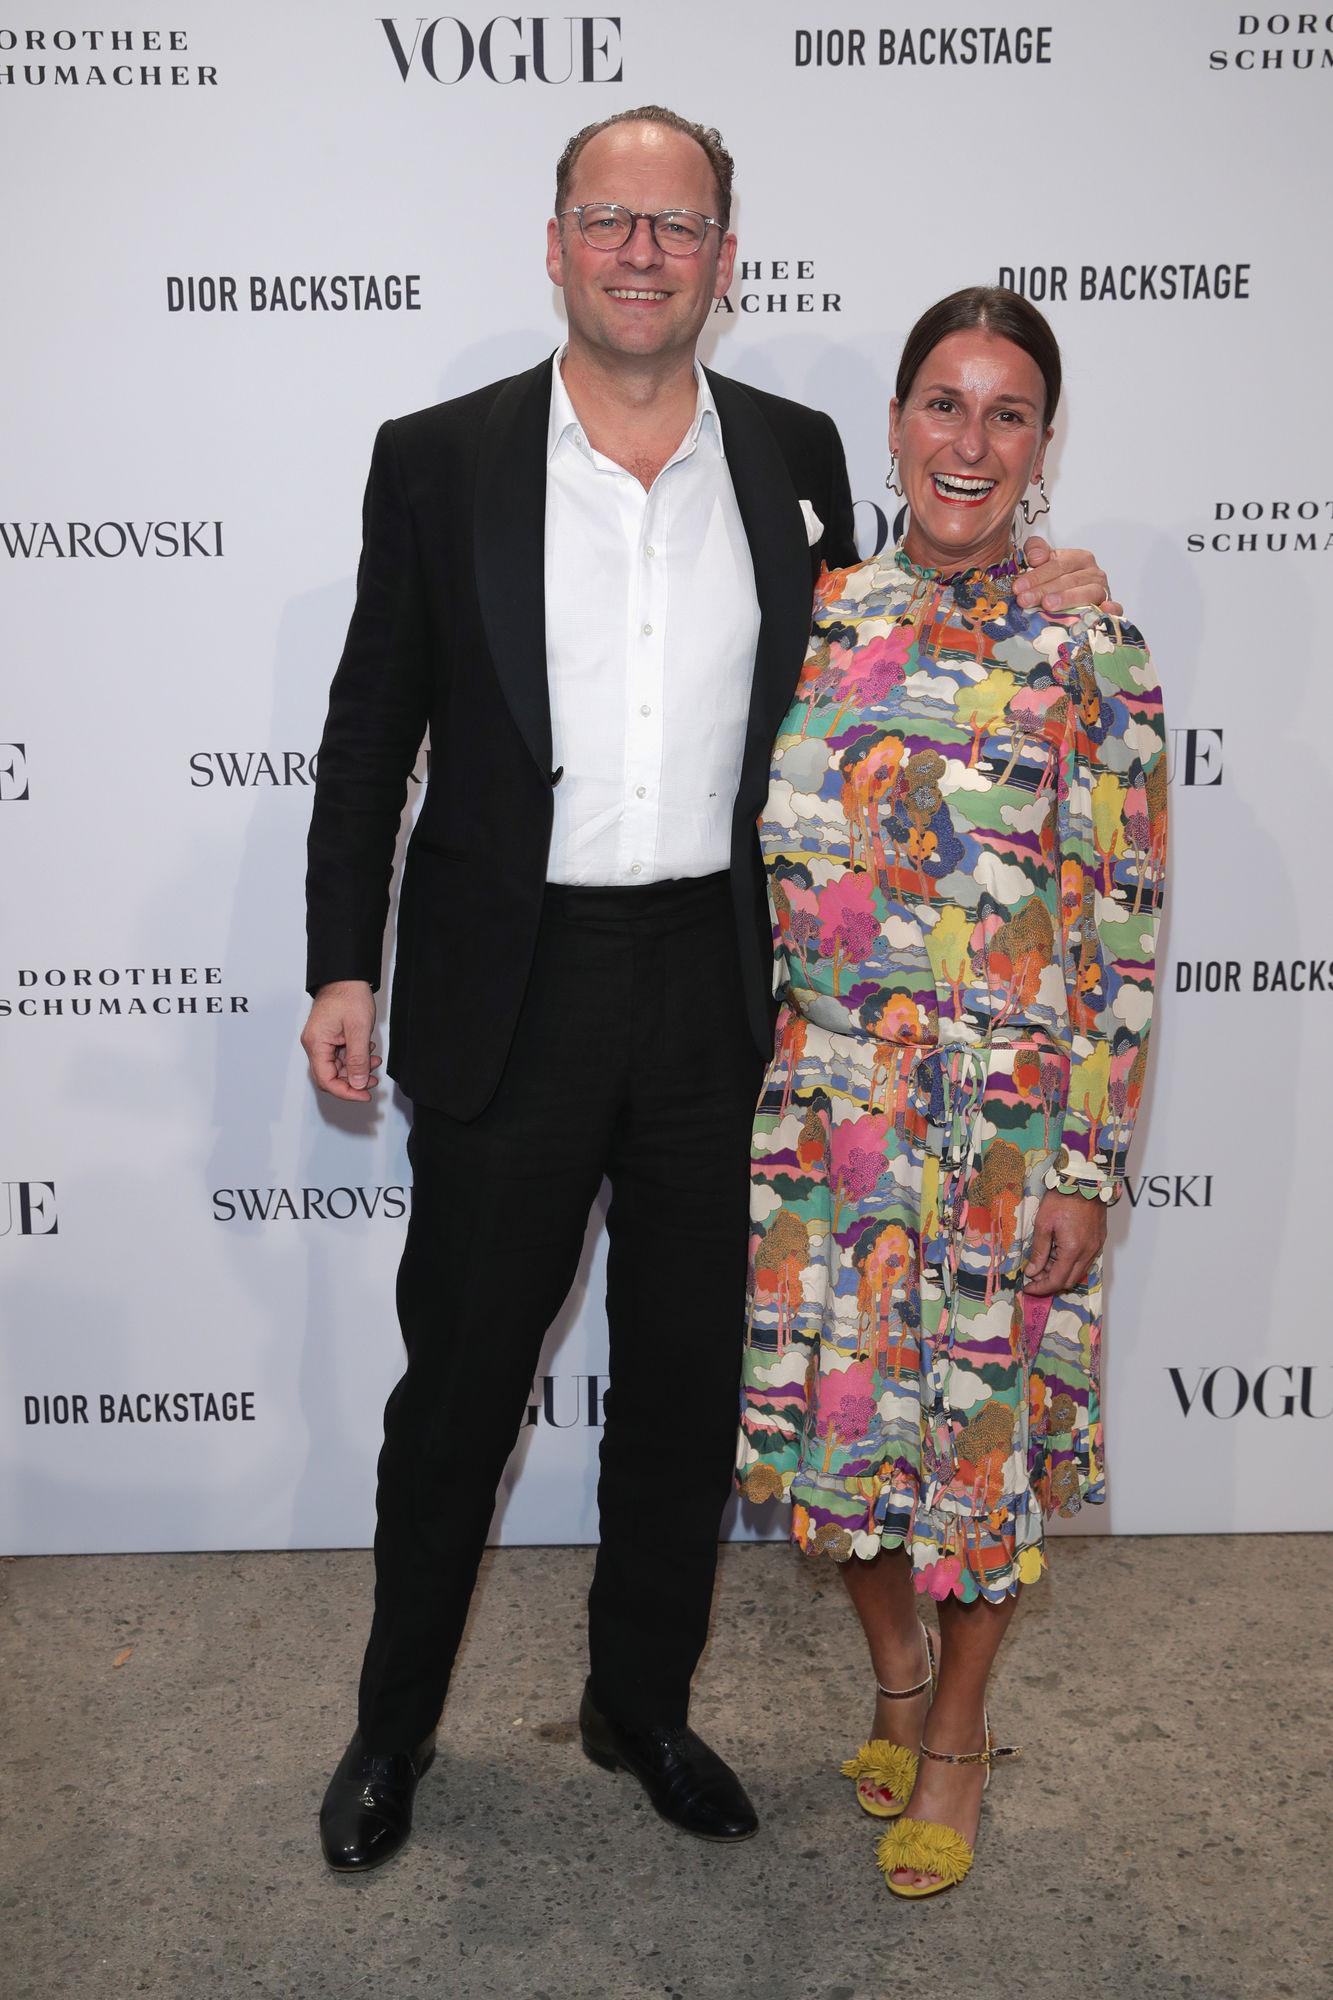 VOGUE Fashion Party Berlin Fashion Week 2018